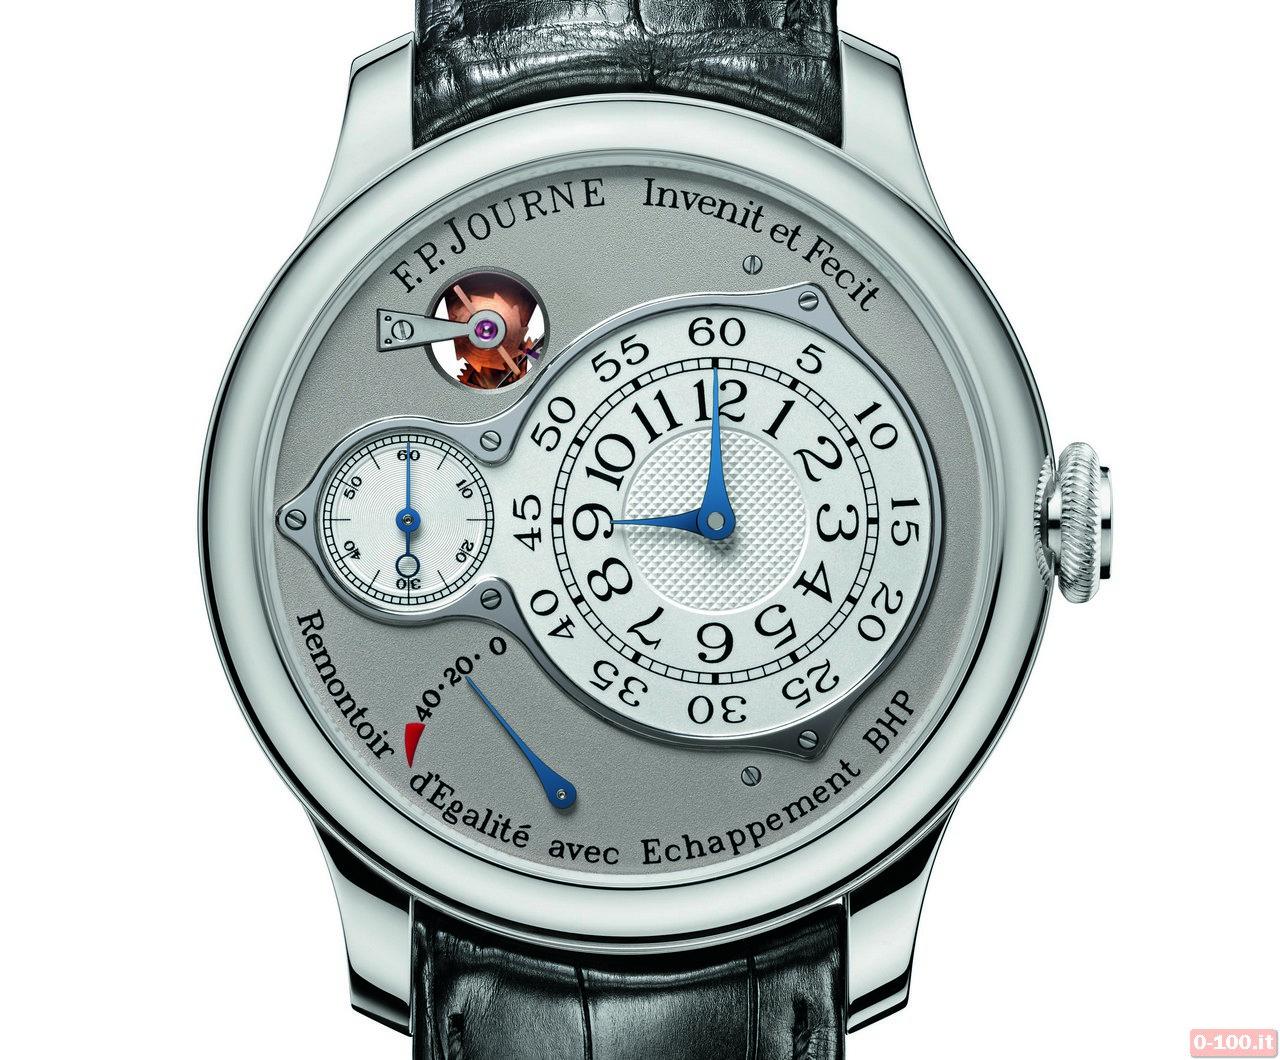 f-p-journe-chronometre-optimum-0-100_2